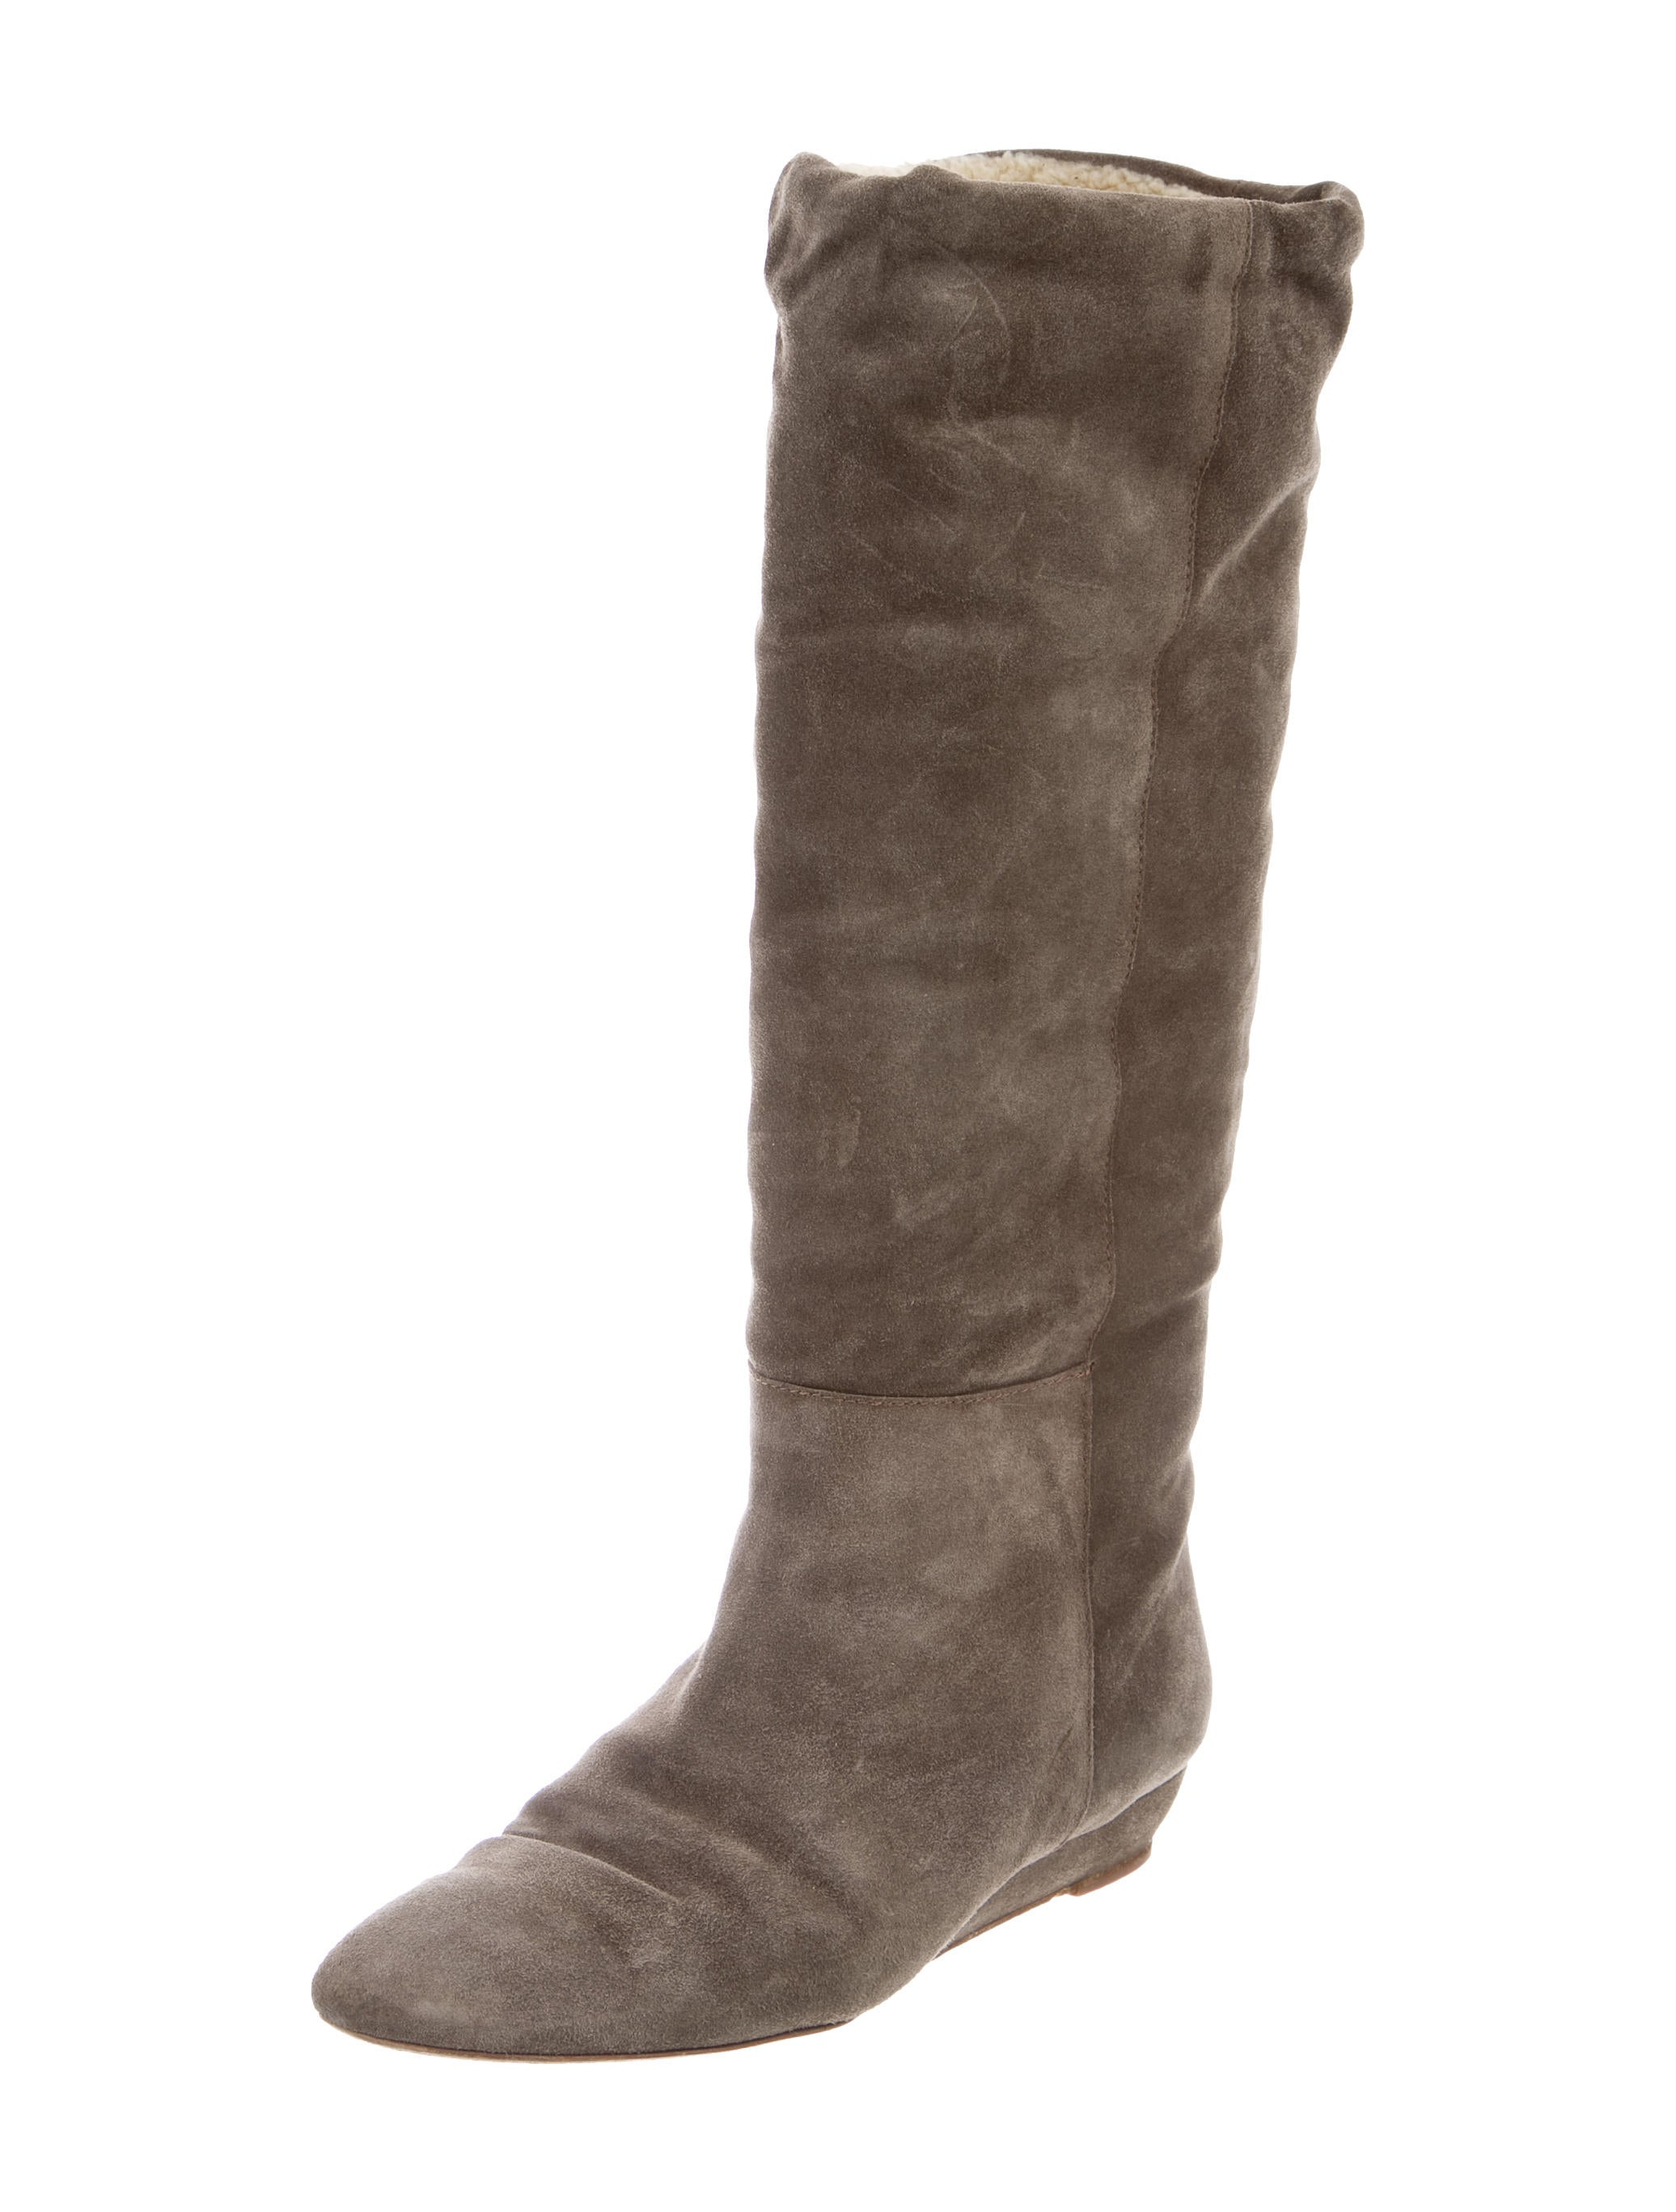 loeffler randall shearling wedge boots shoes wlf25276